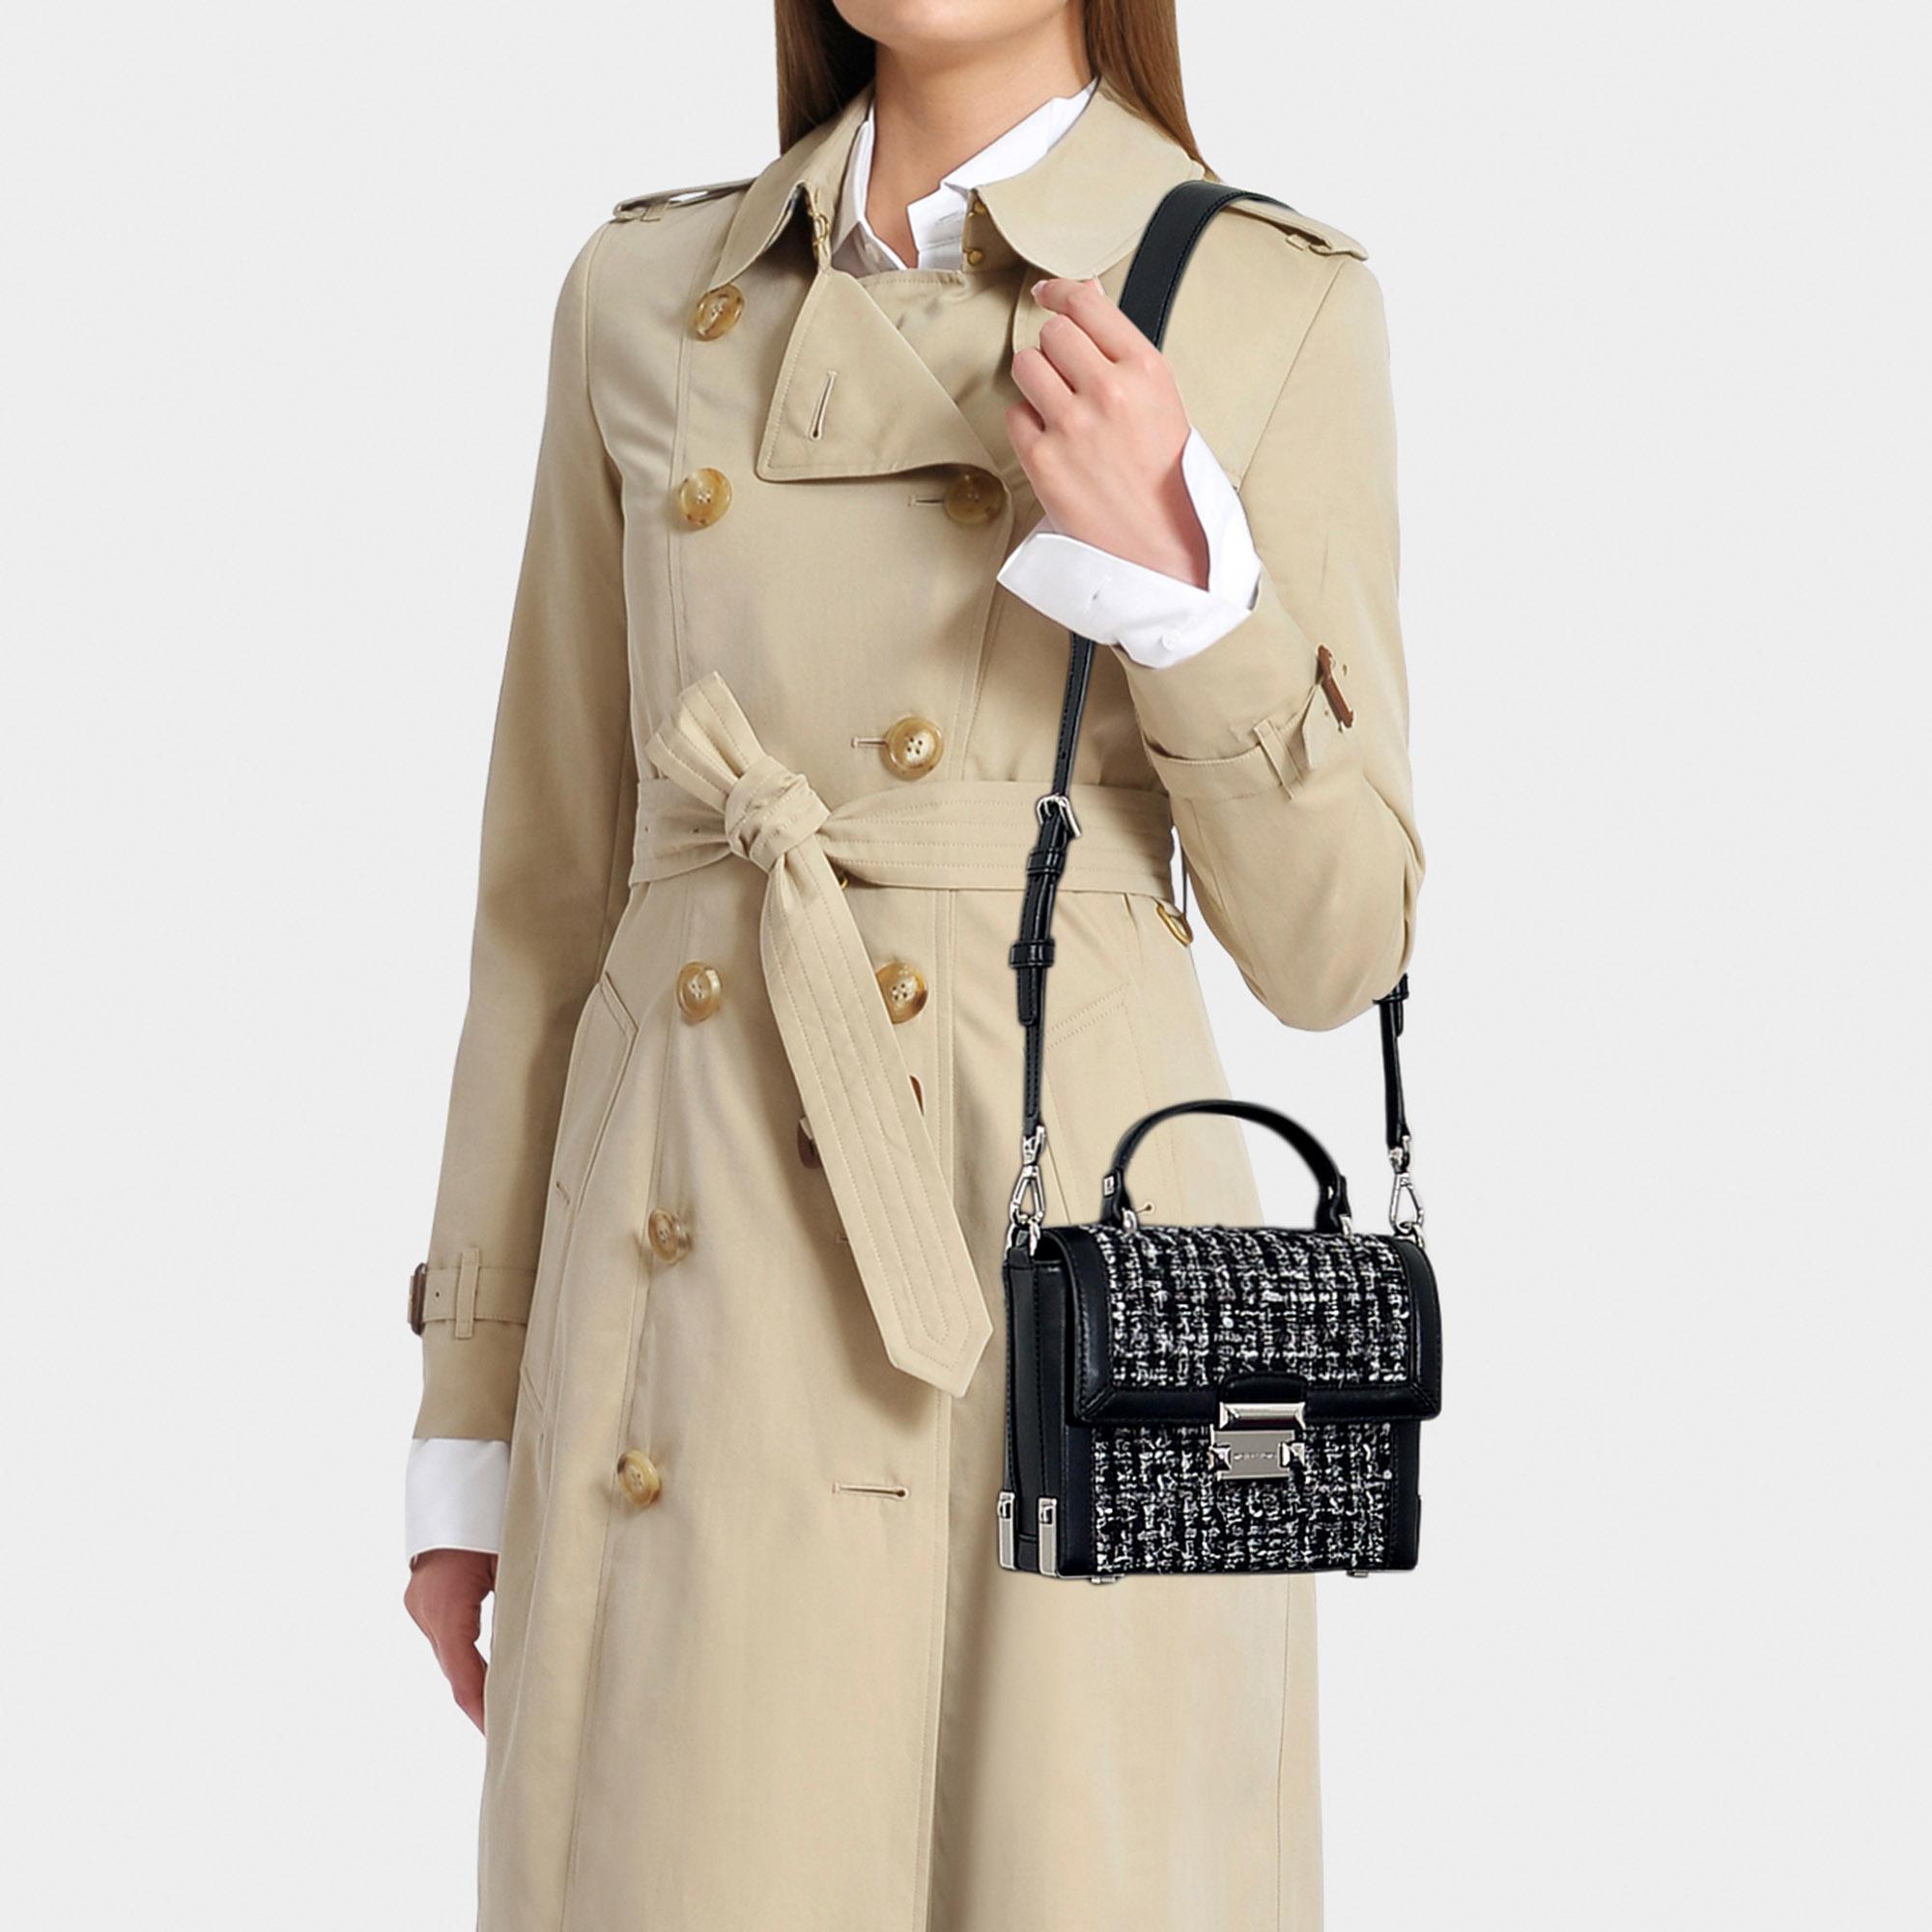 0993a164d1b74 MICHAEL Michael Kors - Jayne Small Trunk Bag In Black Tweed - Lyst. View  fullscreen